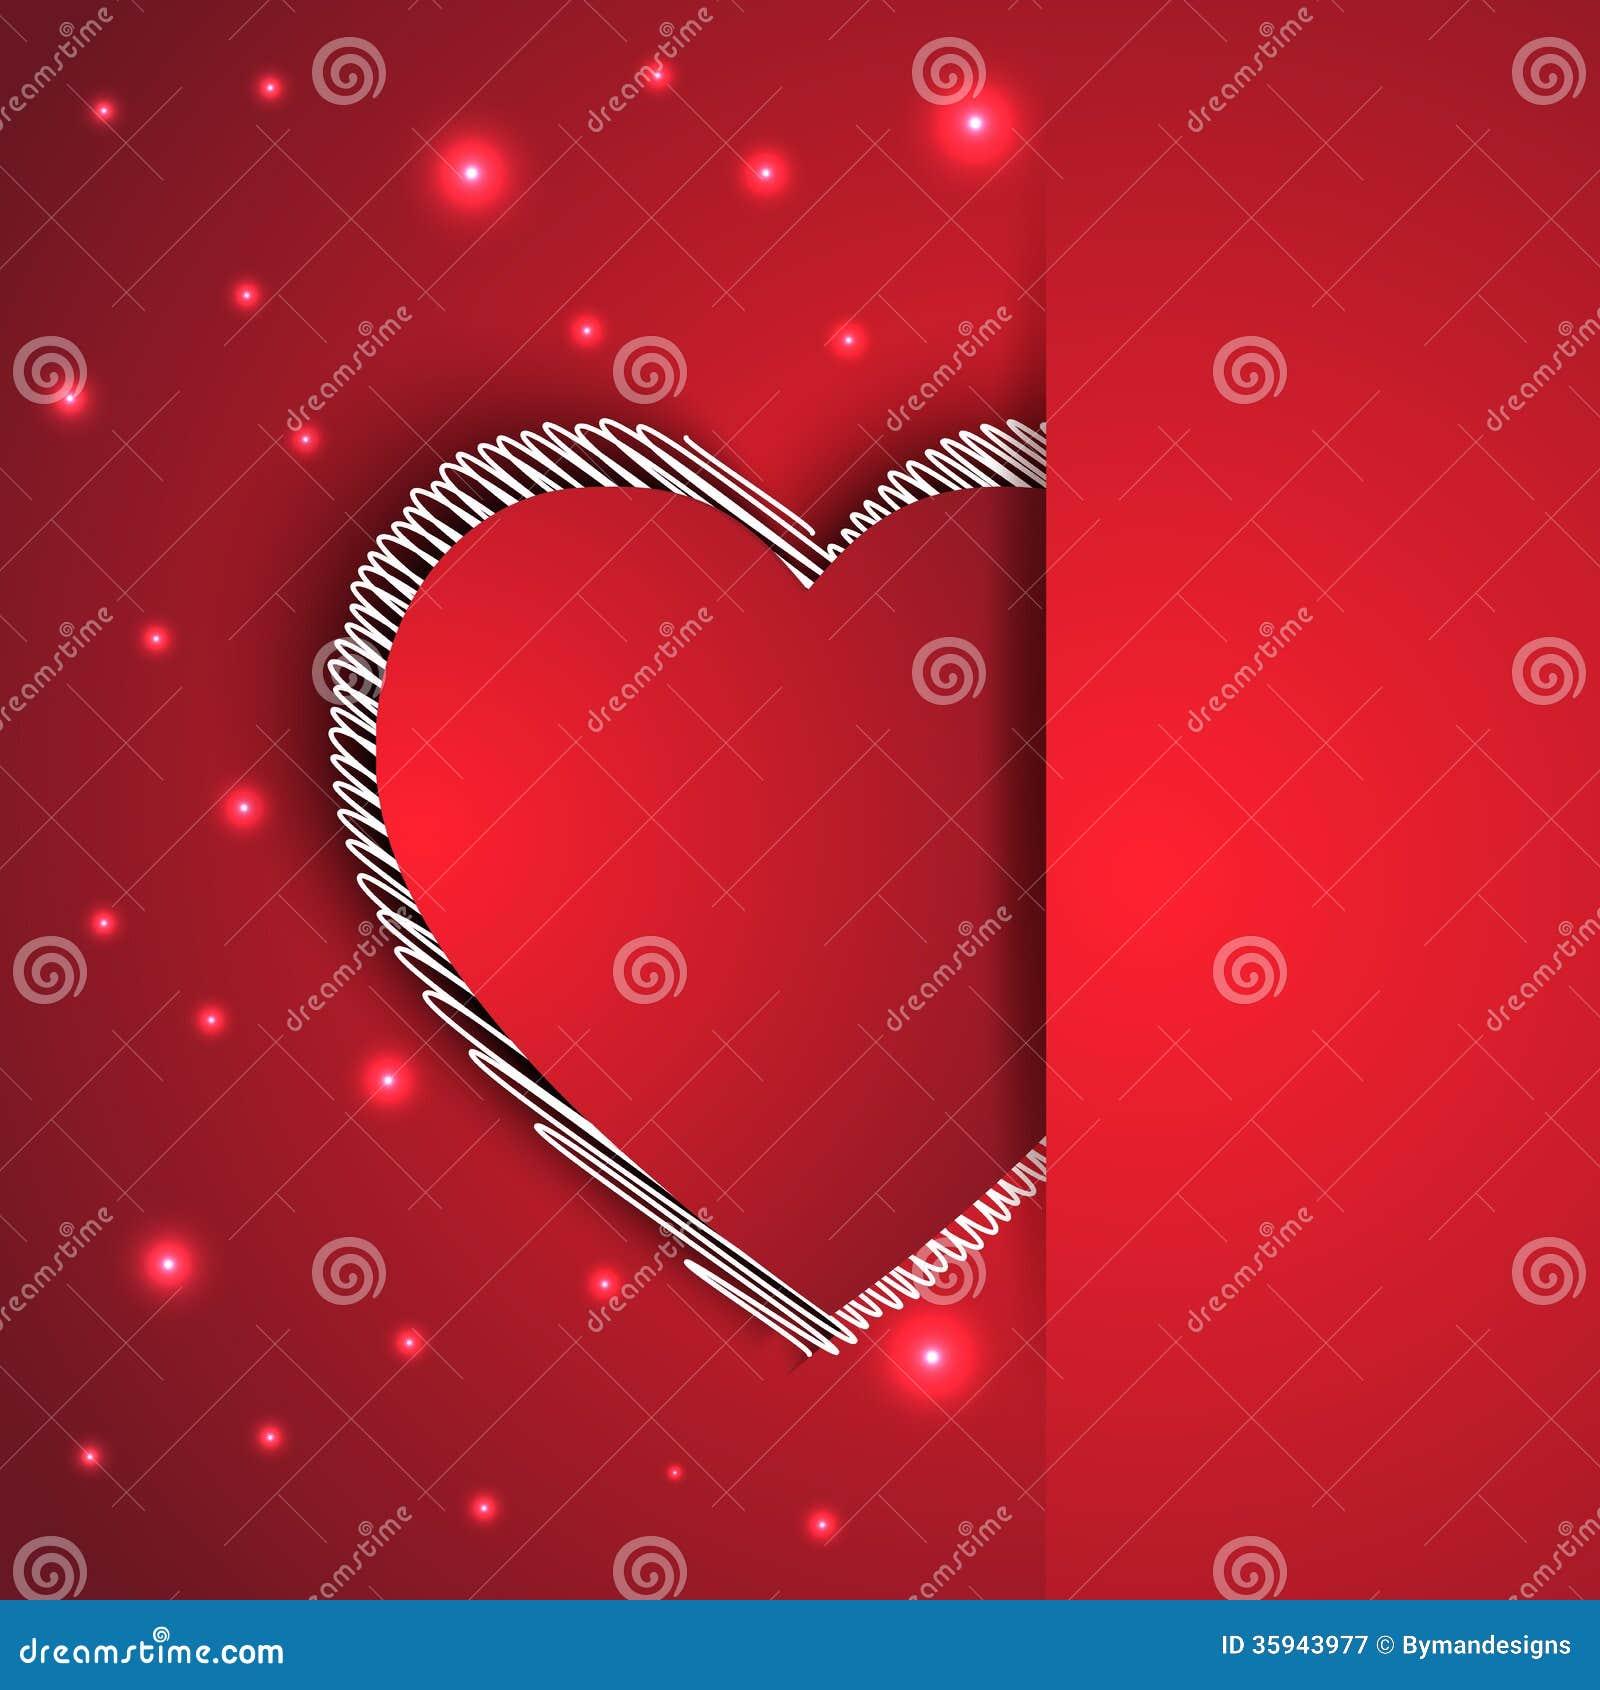 hearts shape romantic greeting card stock vector illustration of